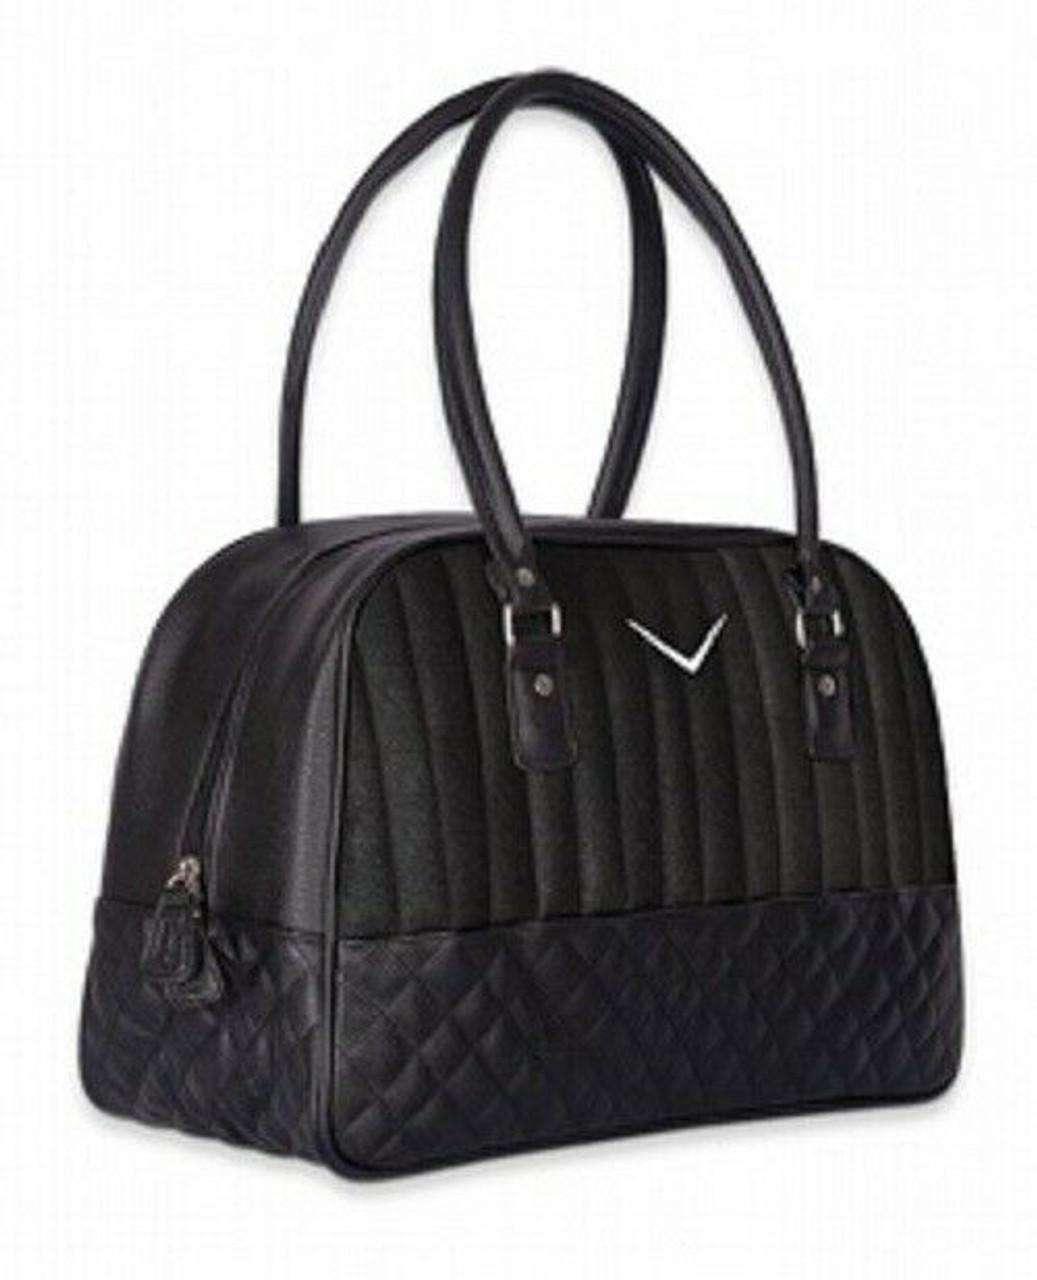 Black leather handbag with flakes